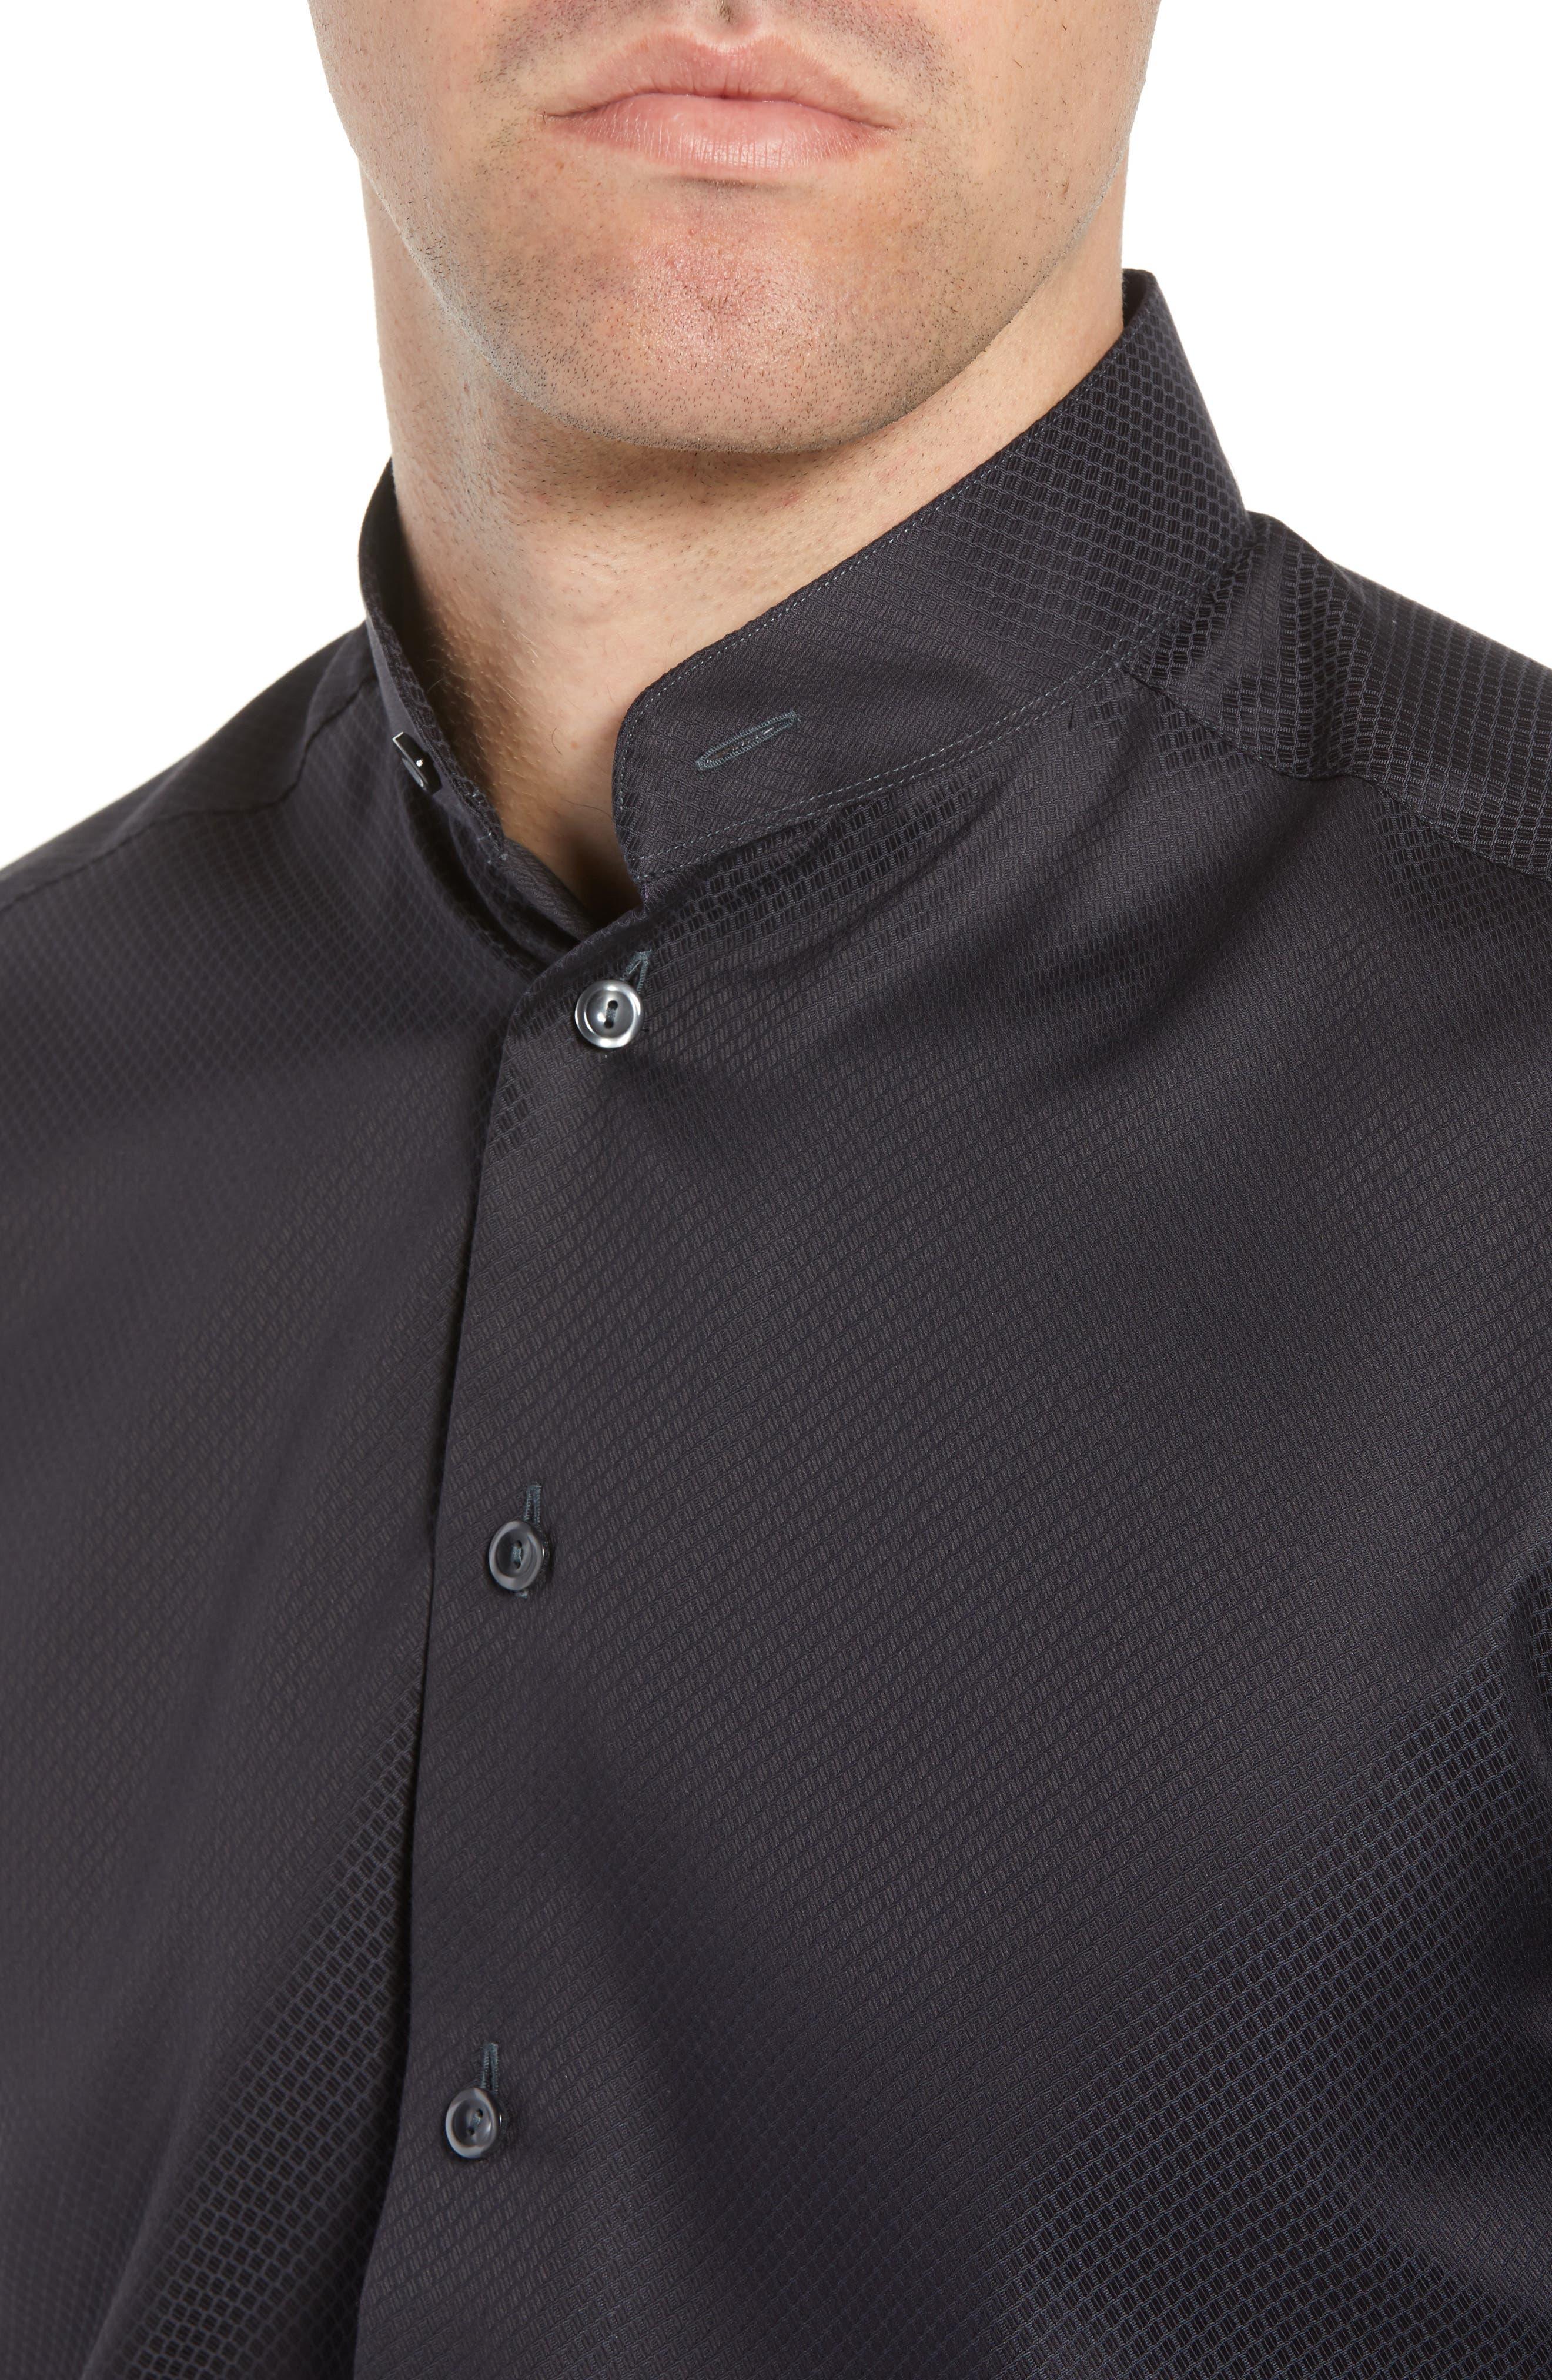 Slim Fit Solid Dress Shirt,                             Alternate thumbnail 2, color,                             001